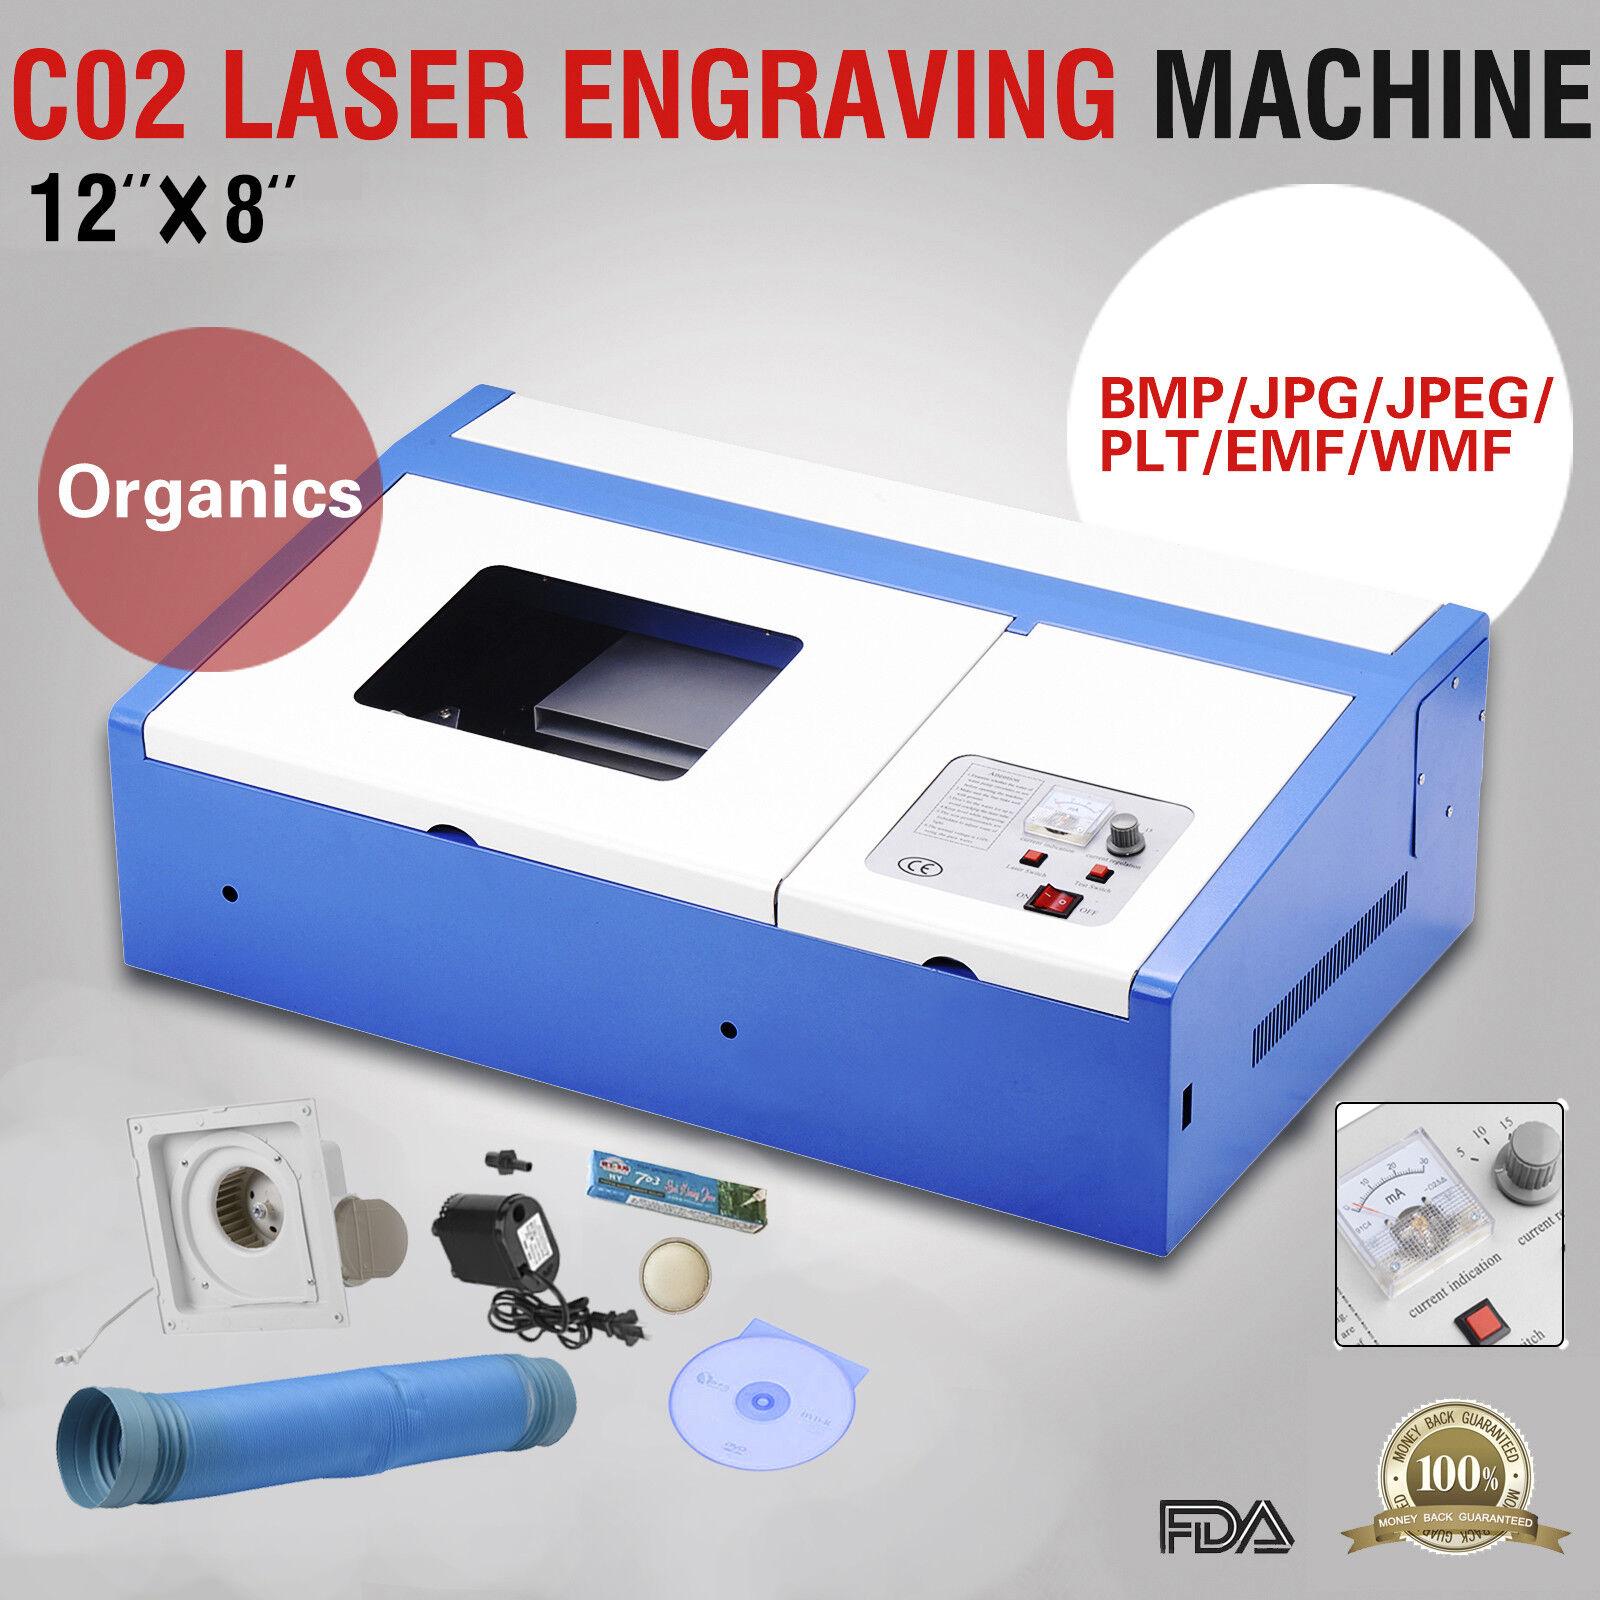 40w 12 39 39 x8 39 39 usb co2 laser engraver cutter engraving cutting machine blue ebay. Black Bedroom Furniture Sets. Home Design Ideas